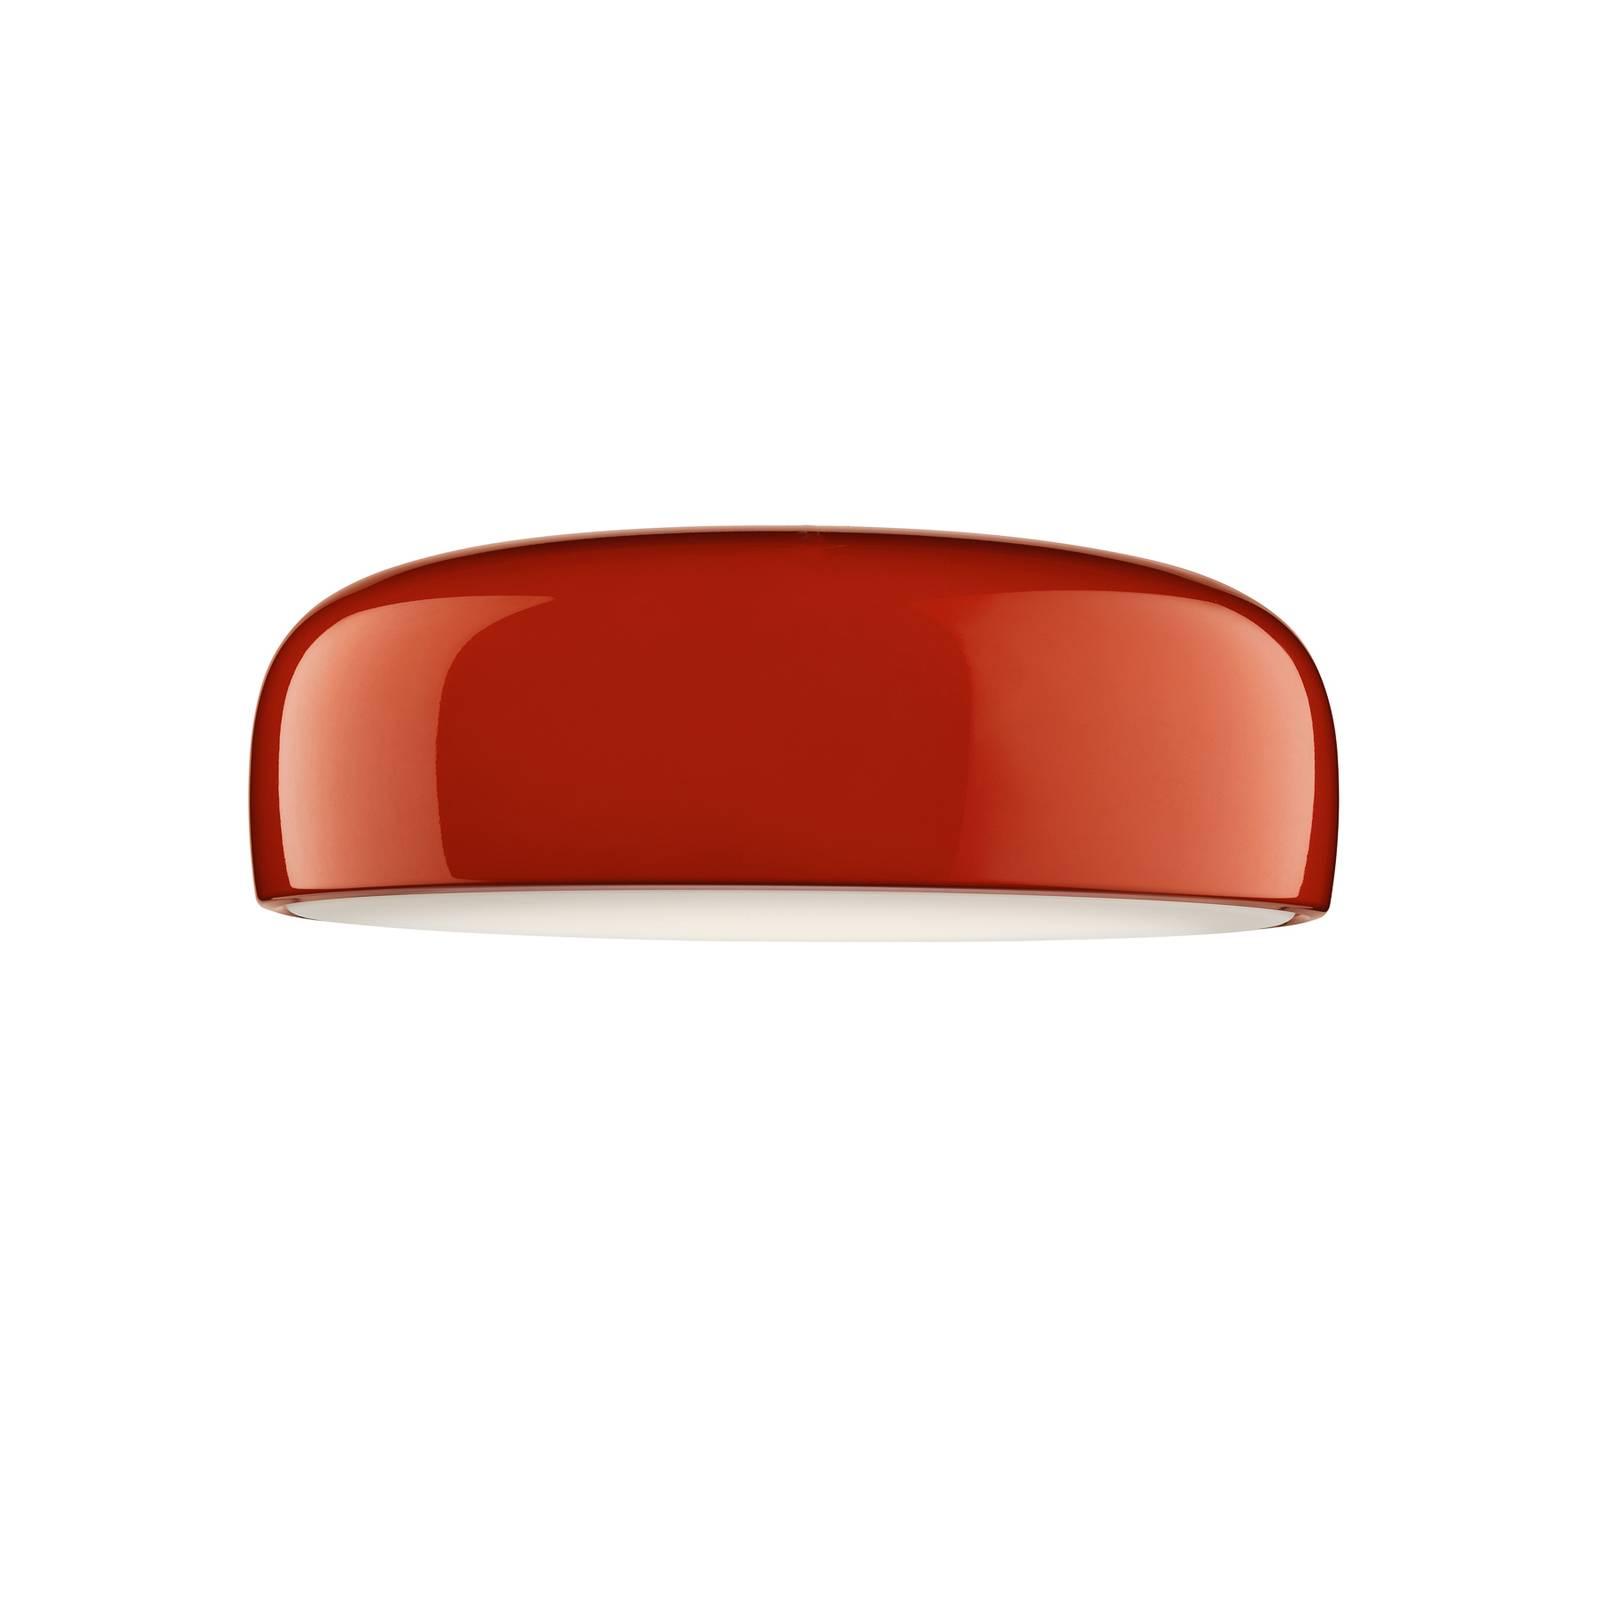 FLOS Smithfield C LED-Deckenleuchte in Rot